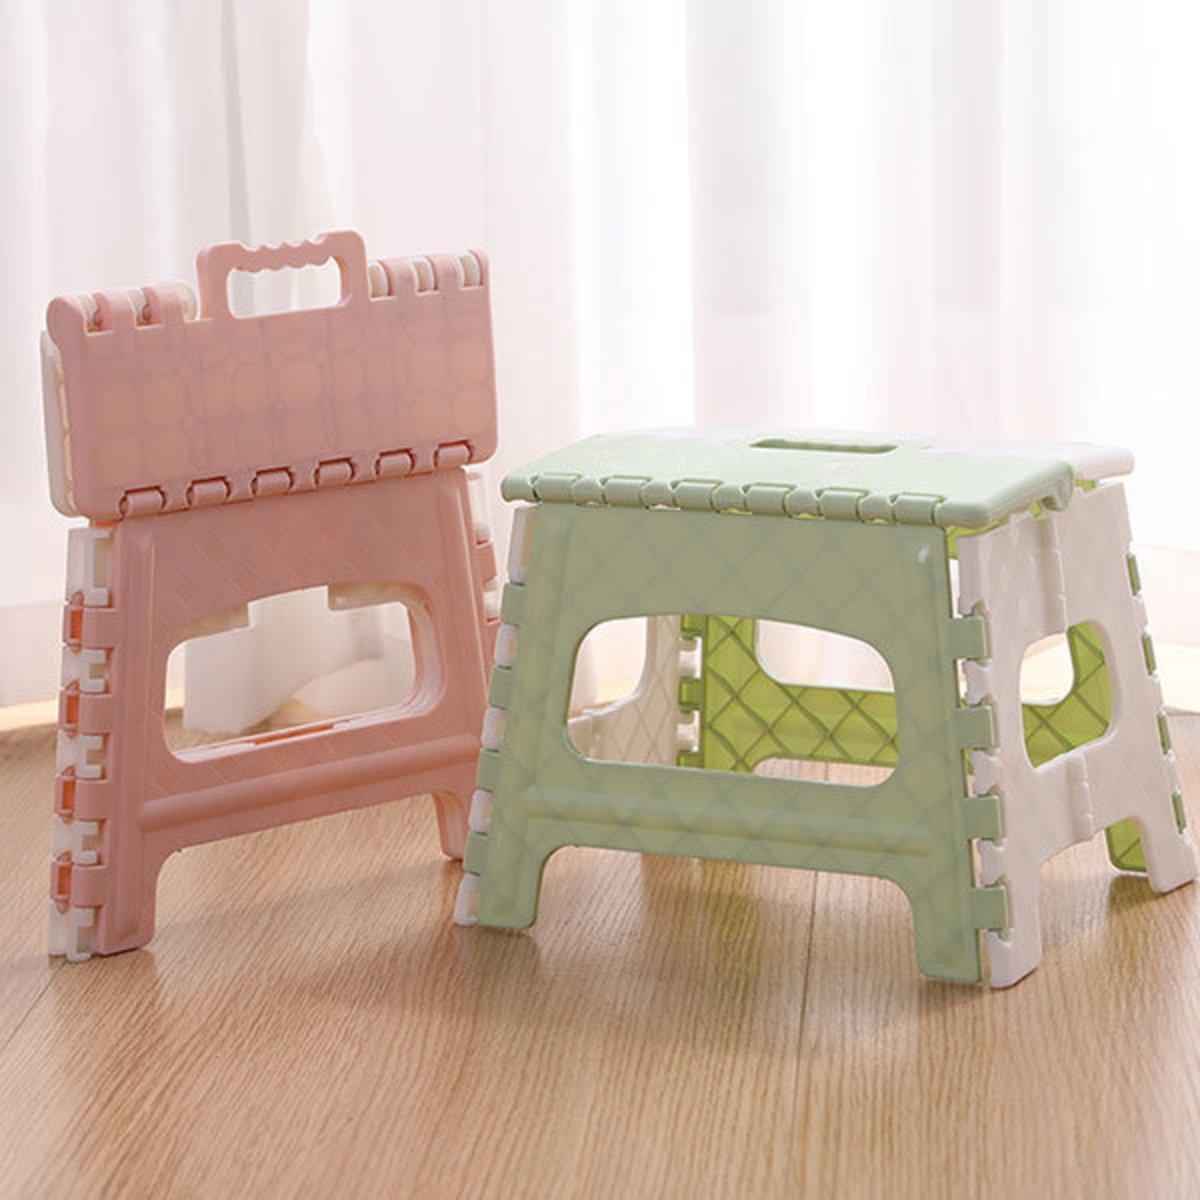 Household folding bench